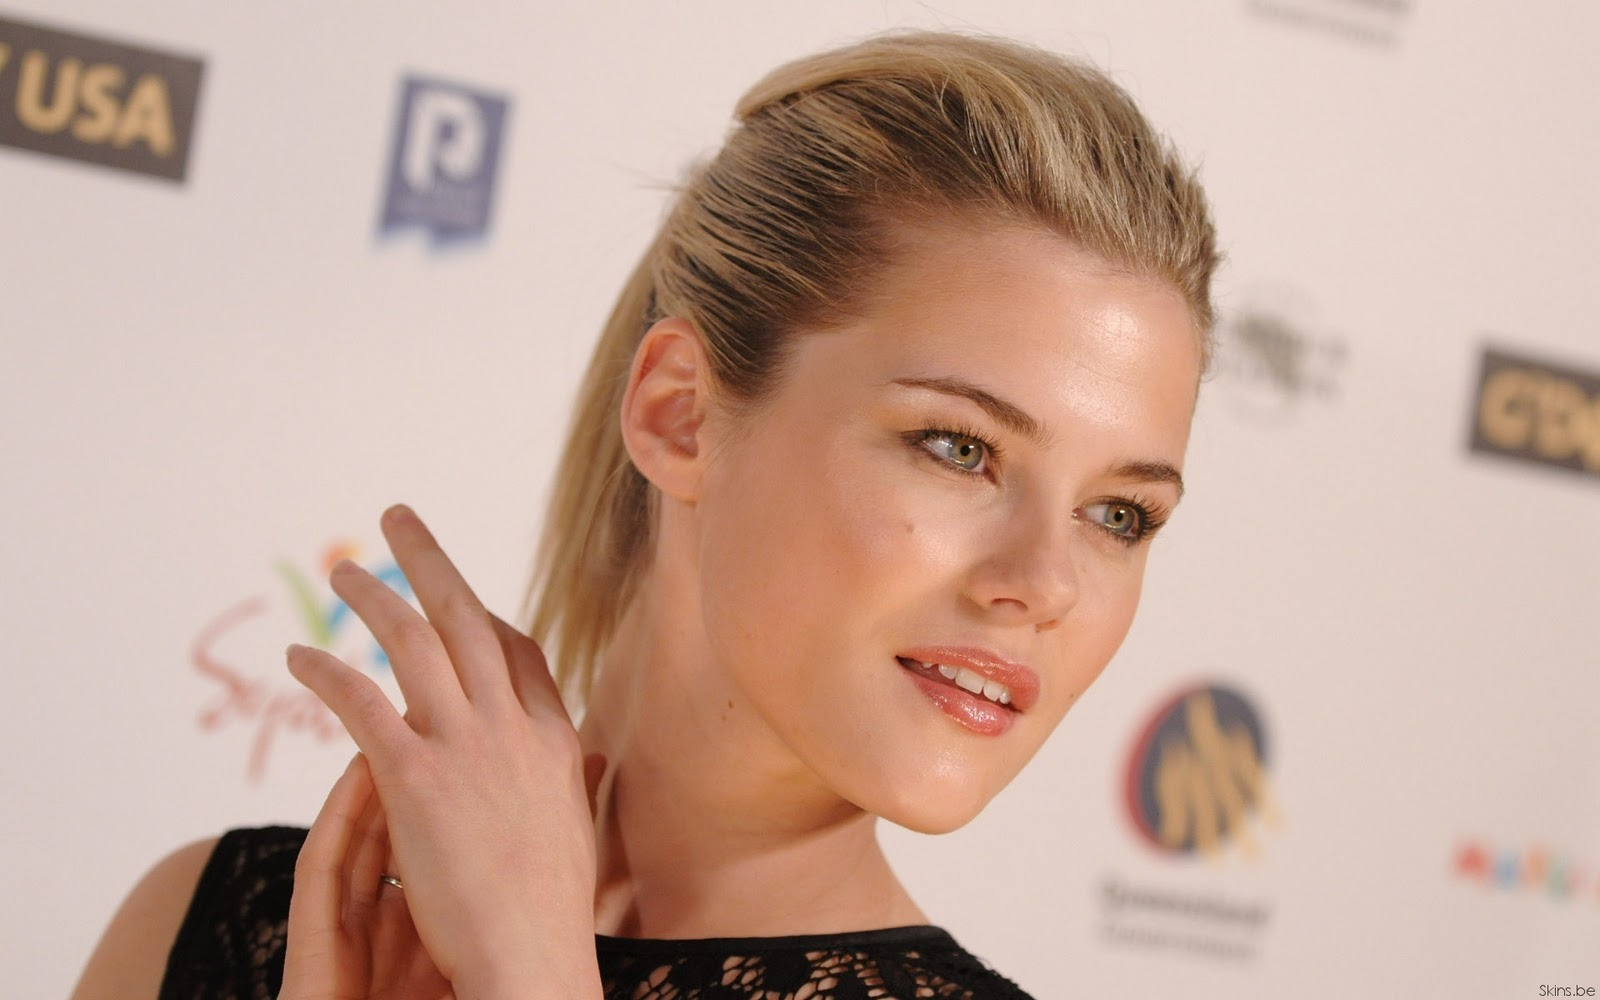 http://2.bp.blogspot.com/-VO6urnMVFhA/TymFmnoALDI/AAAAAAAAB2g/ZdmEToE26ZI/s1600/Pictures+of+Rachael+Taylor+actress+model+1.jpg